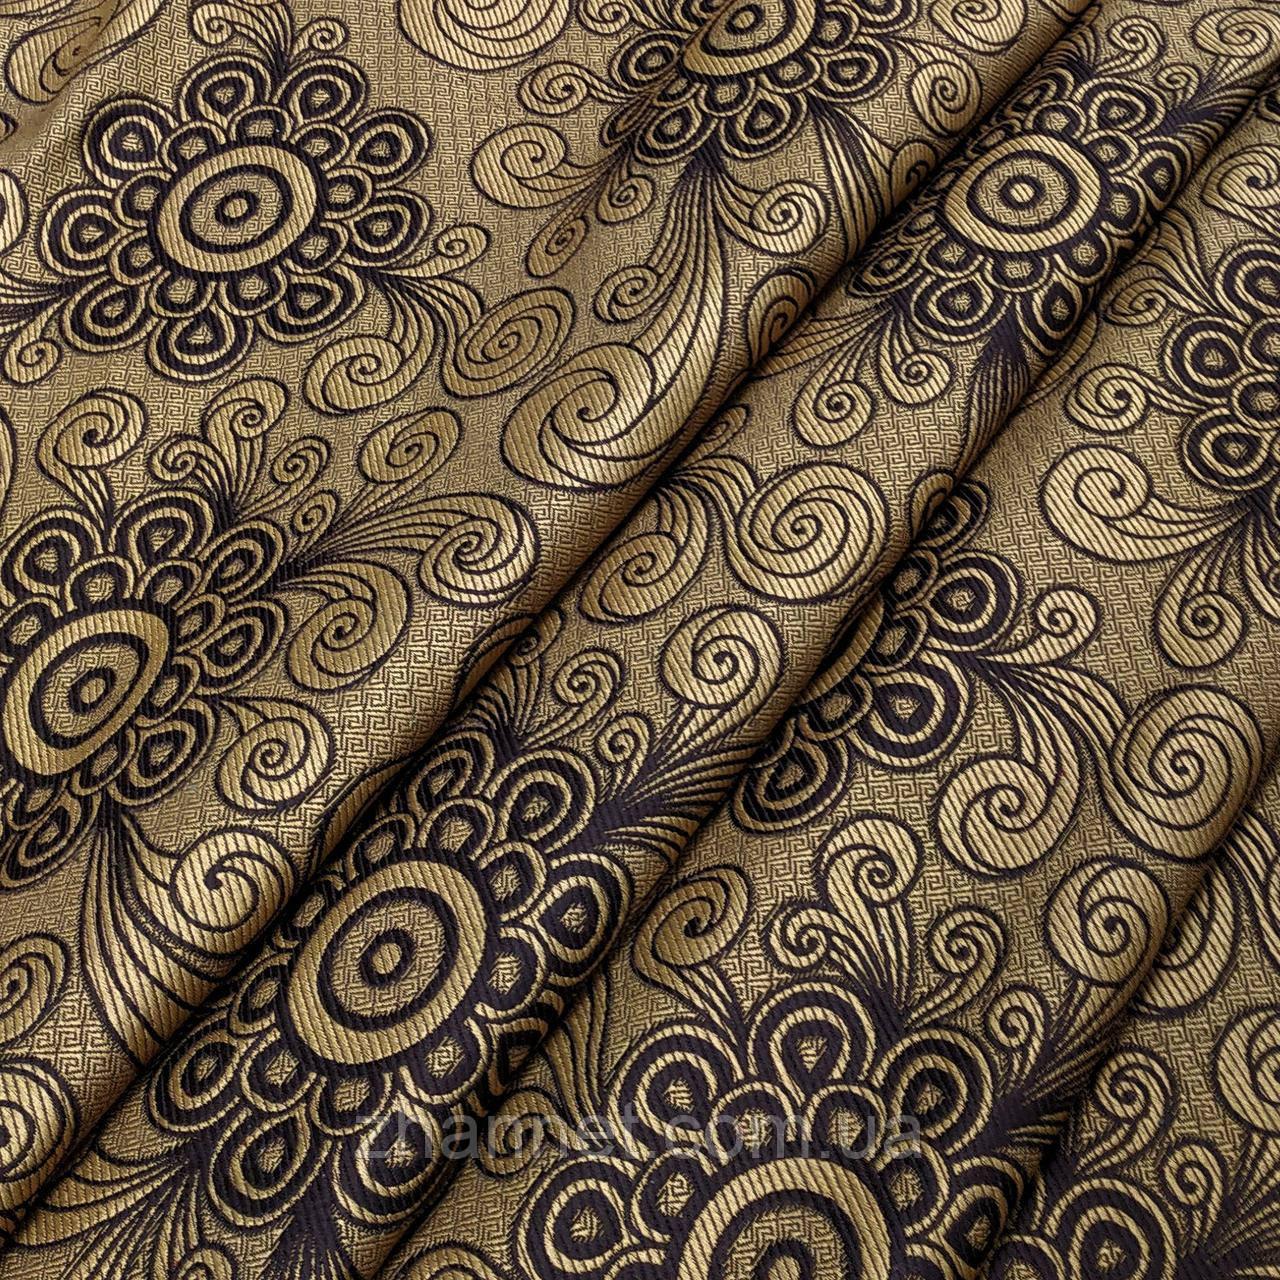 Ткань гобелен Чизана коричневый 150 см (751541)